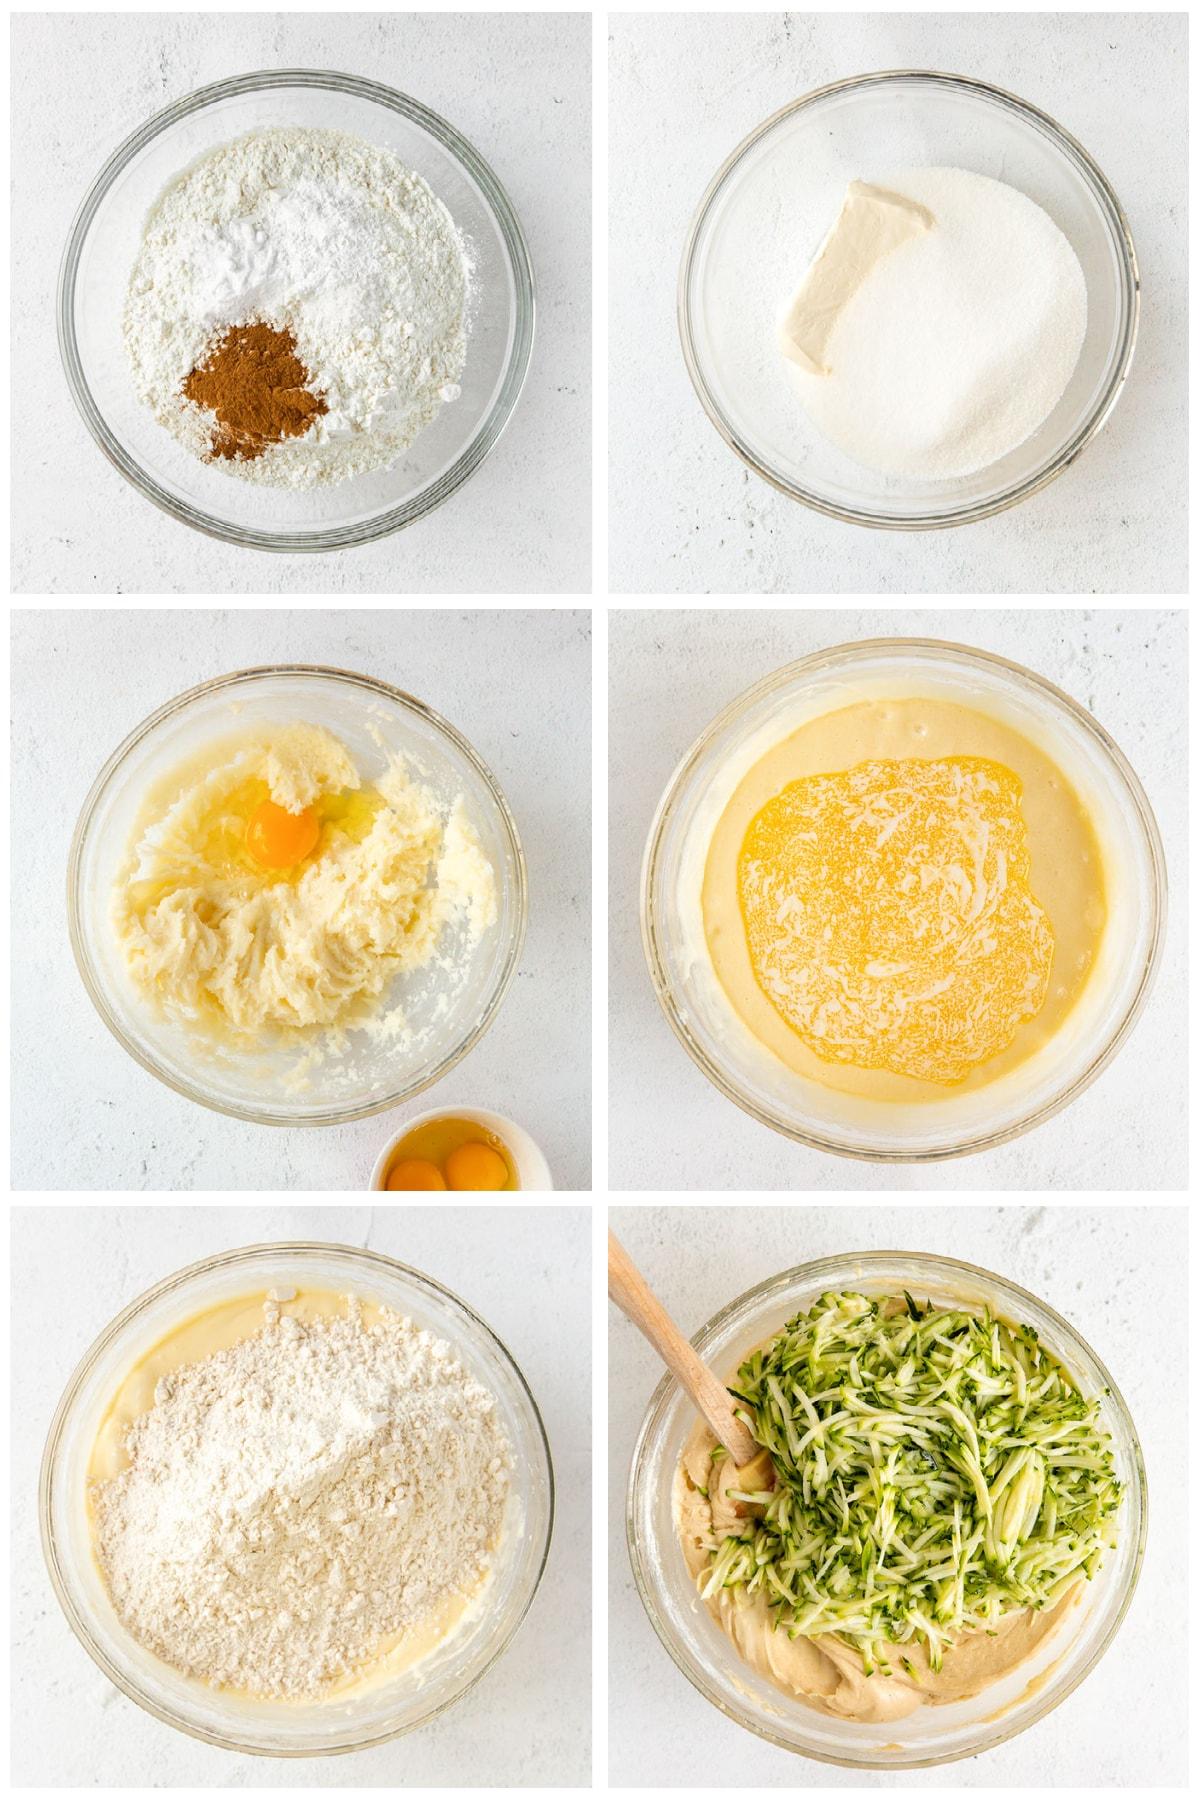 photo collage demonstrating how to make zucchini bundt cake batter